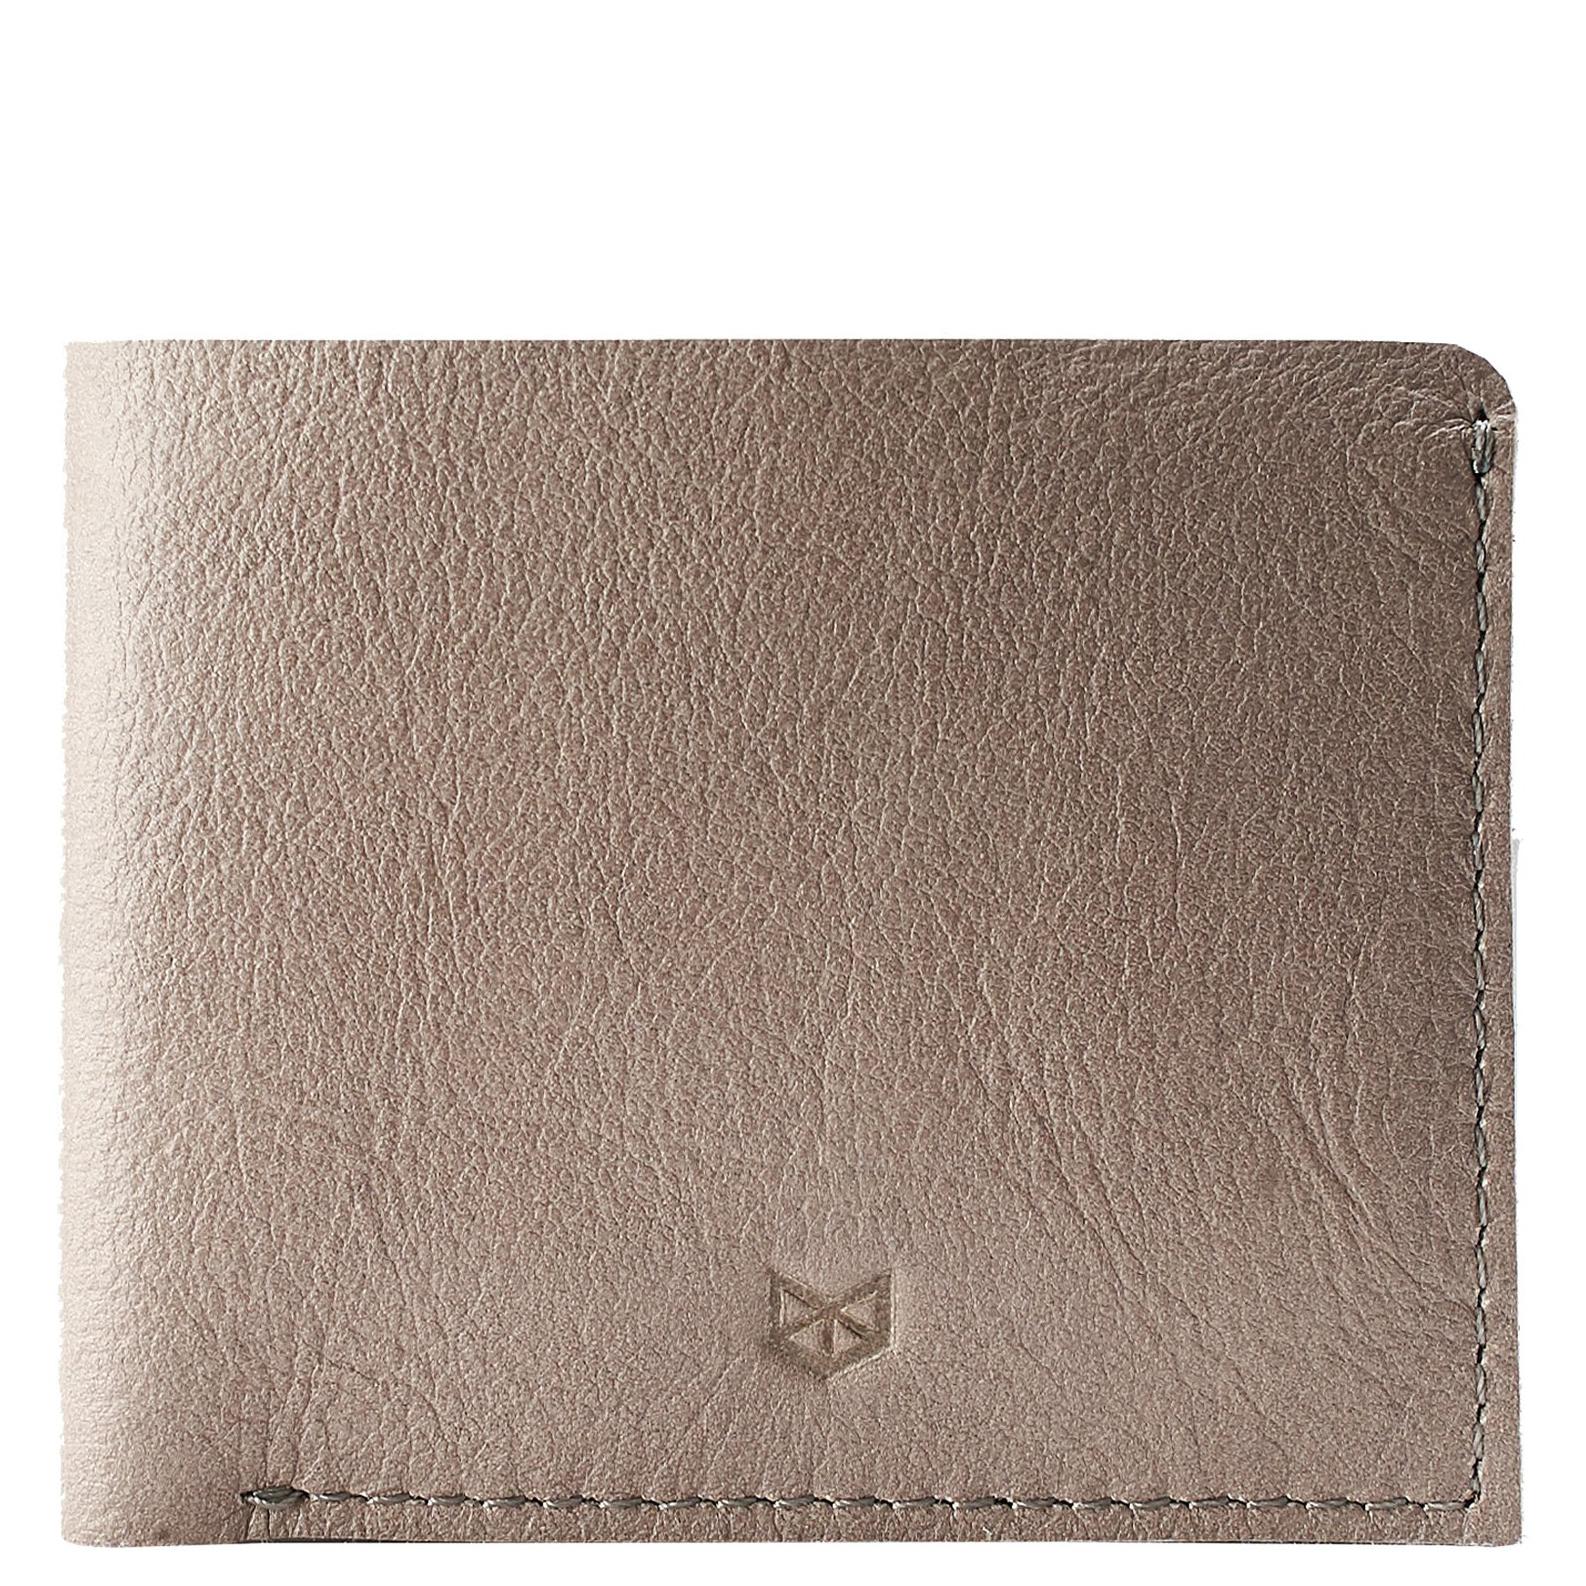 Slim Wallet Set - Grey